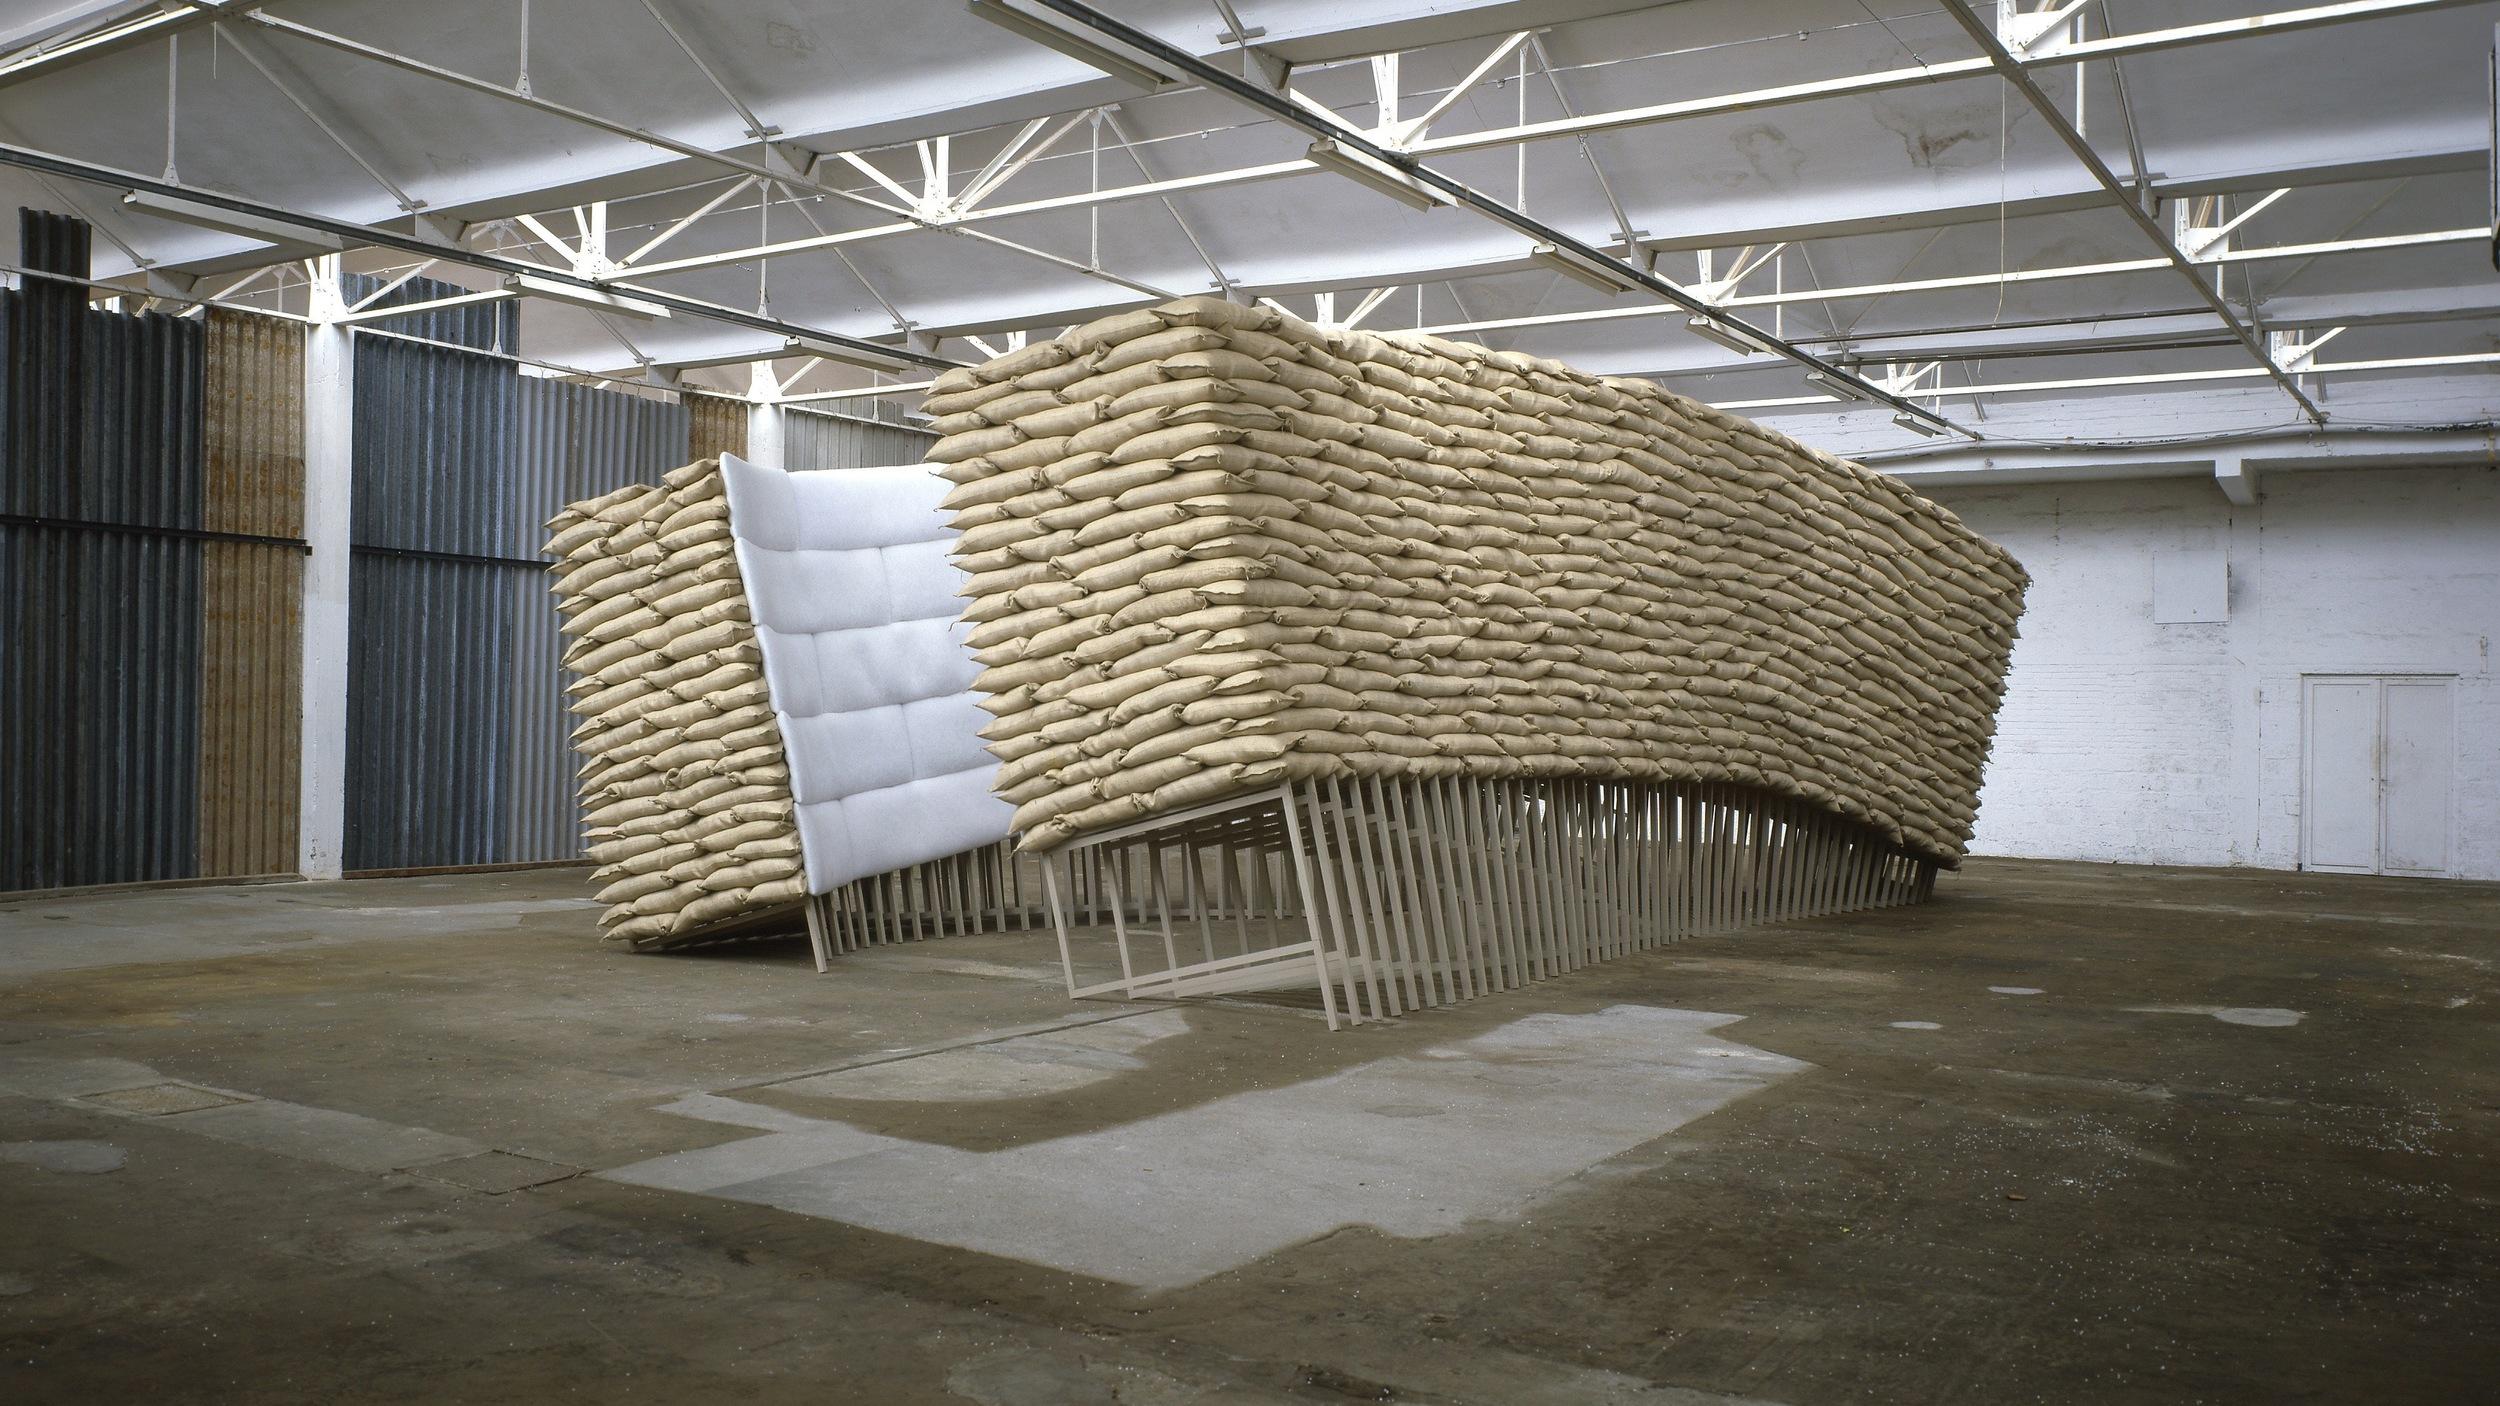 Nancy Turlington, 1994 , wood, sandbags, putty, upholstery, 372 x 604 x 1221 cm. Installation view at Kanaal, Kortrijk, Belgium